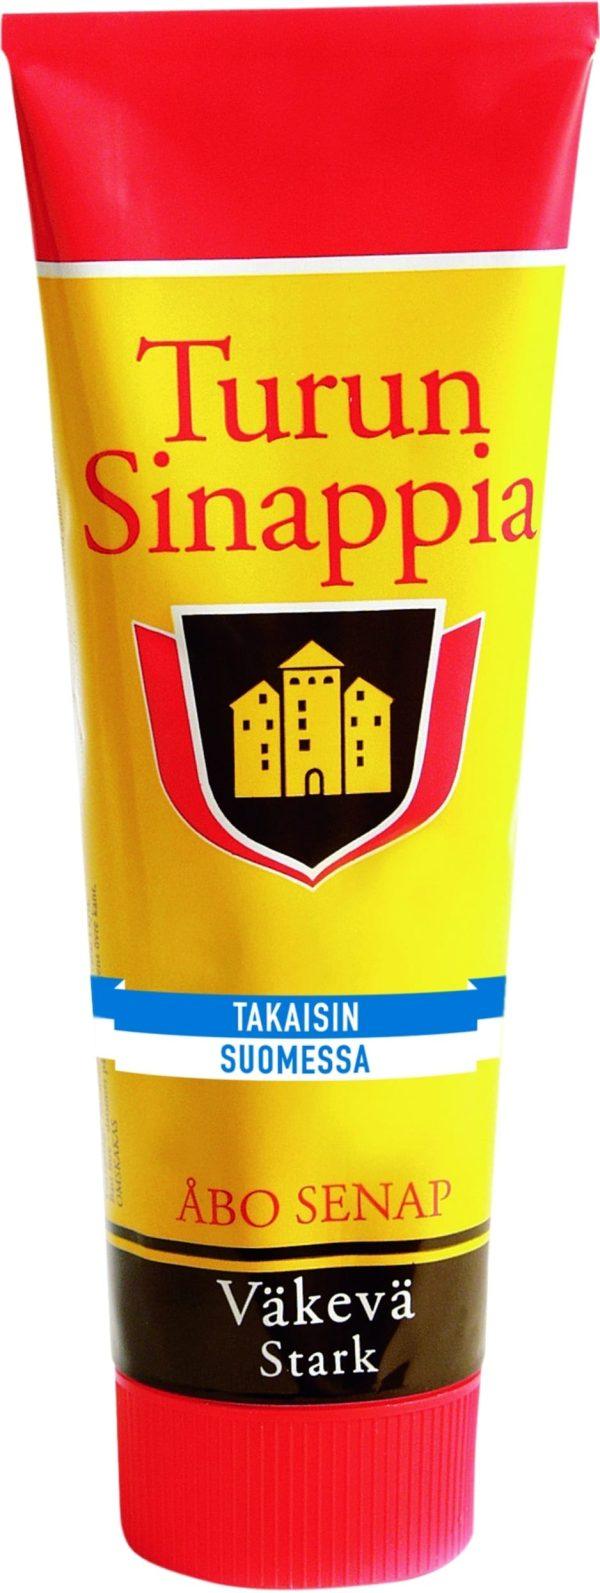 turun sinappi strong mustard